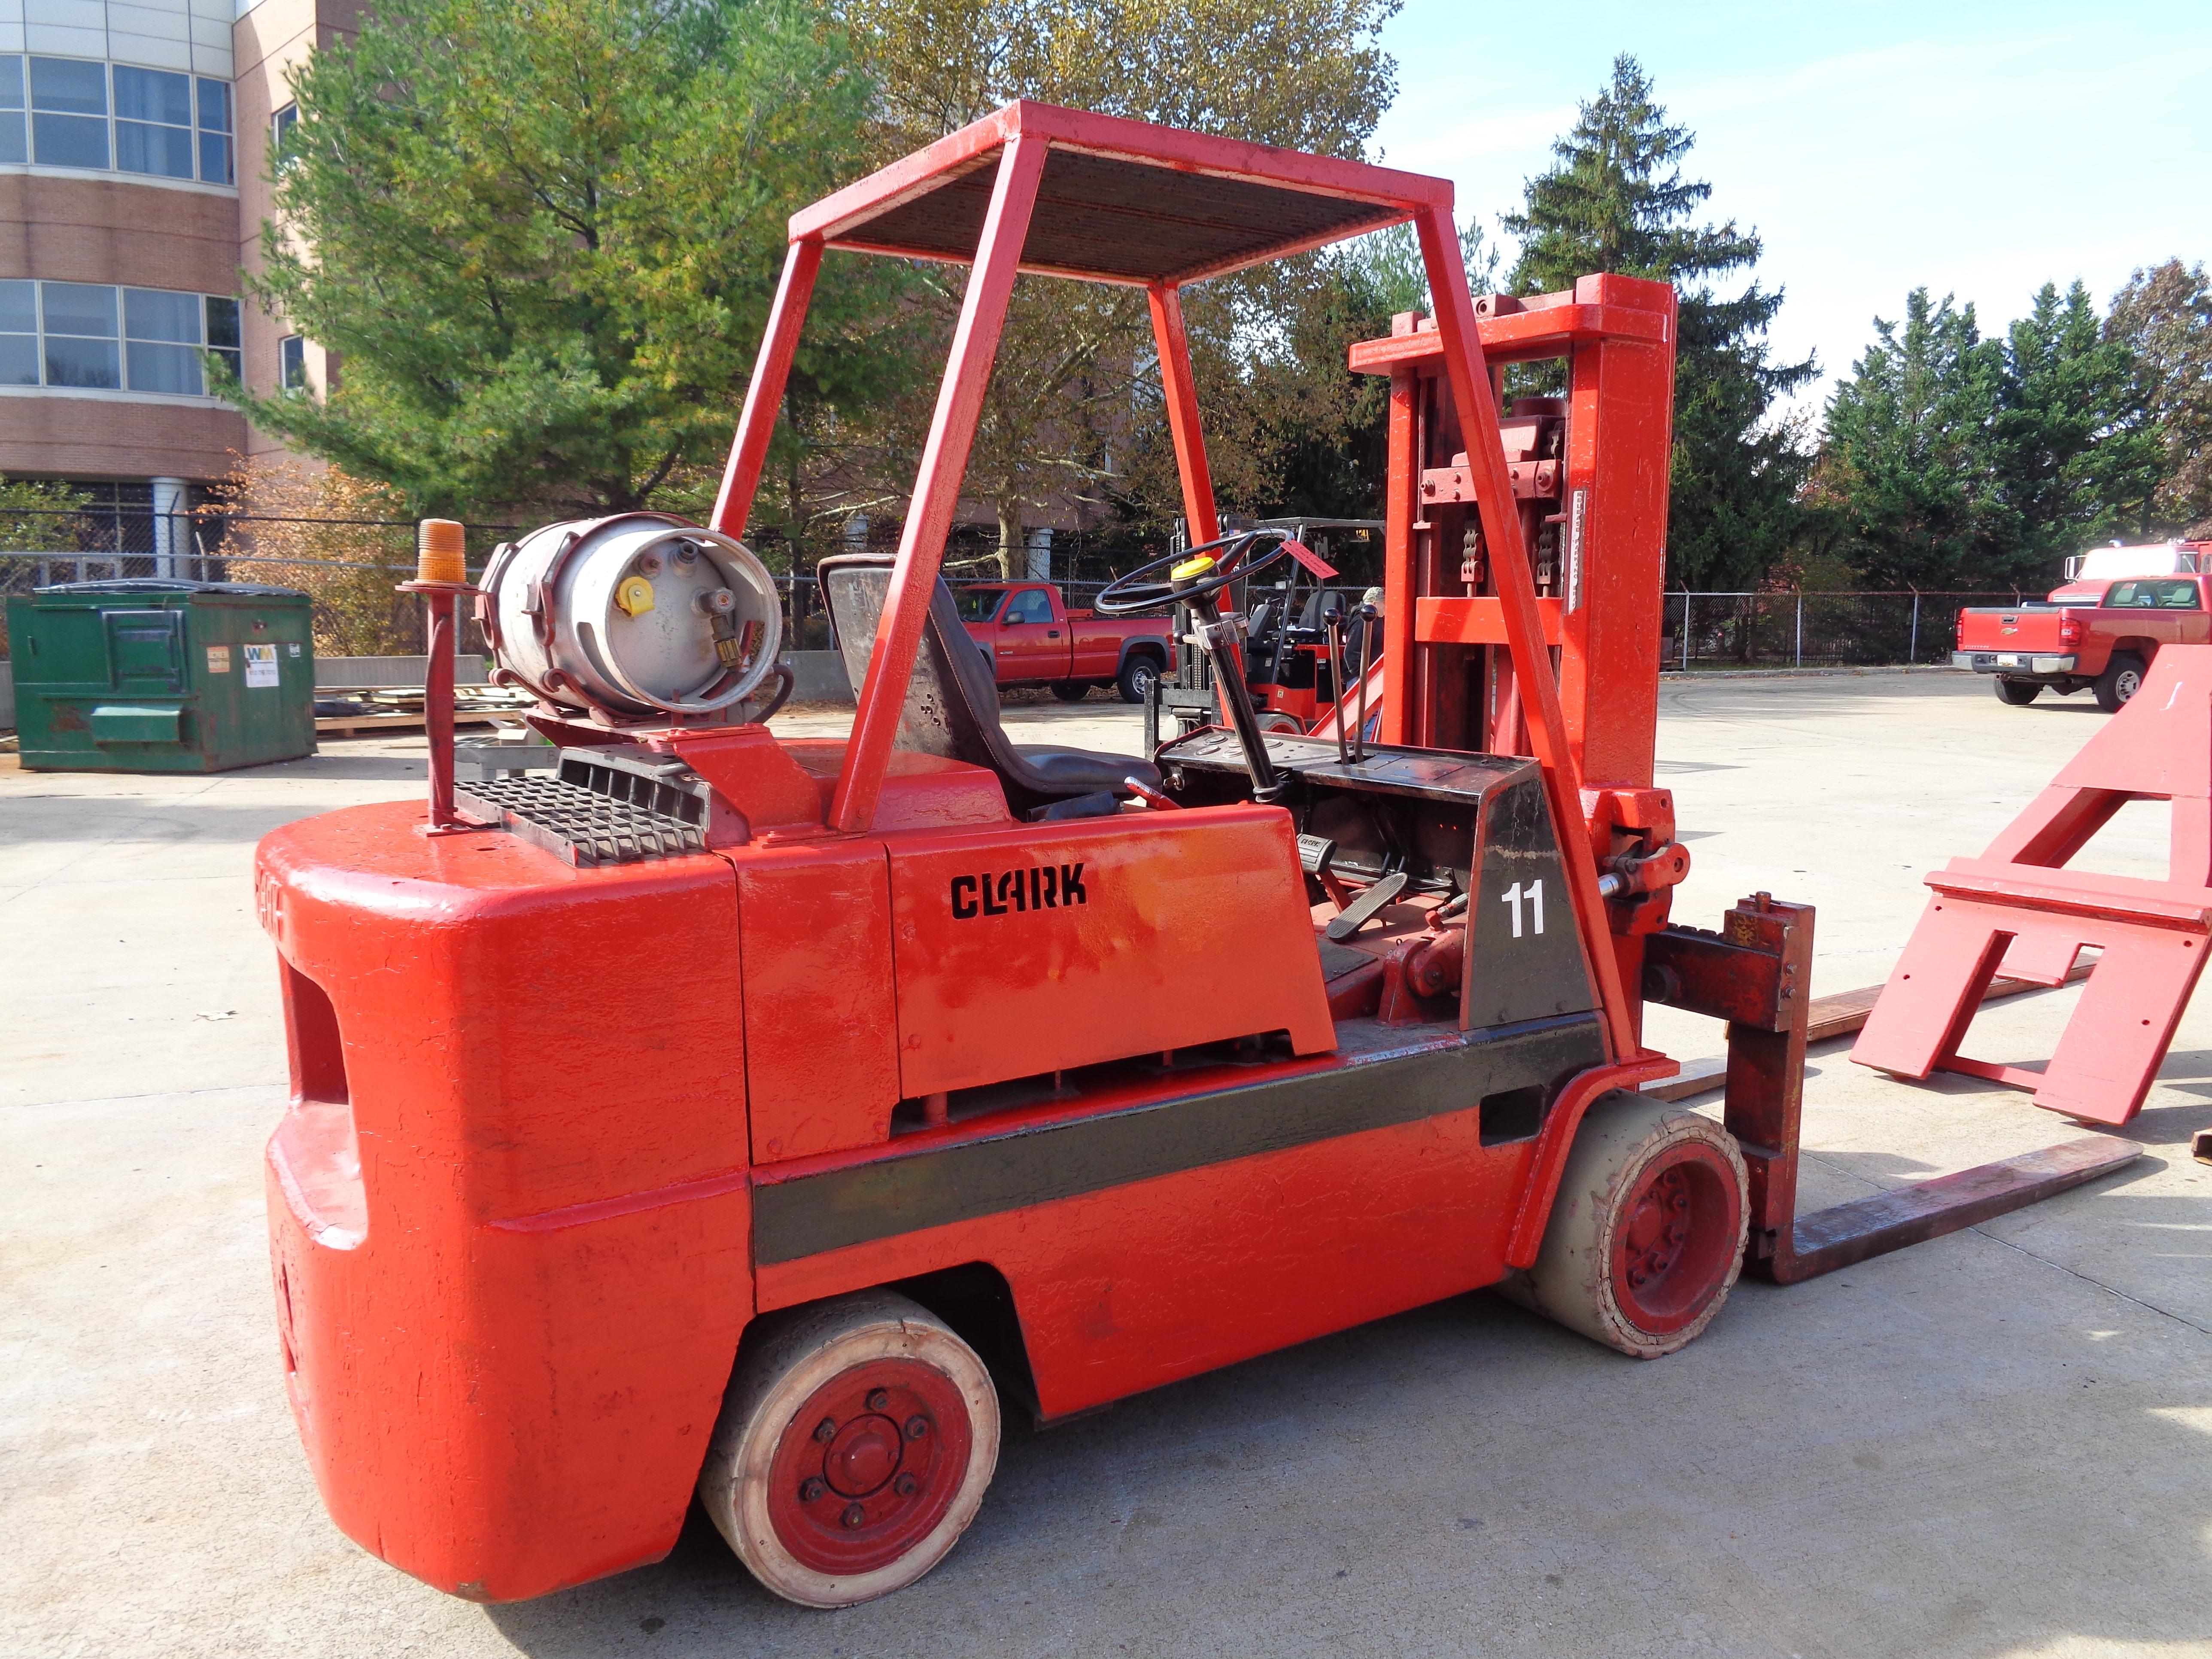 Clark C500-120 Forklift plus boom - 12,000 lbs - Image 5 of 11